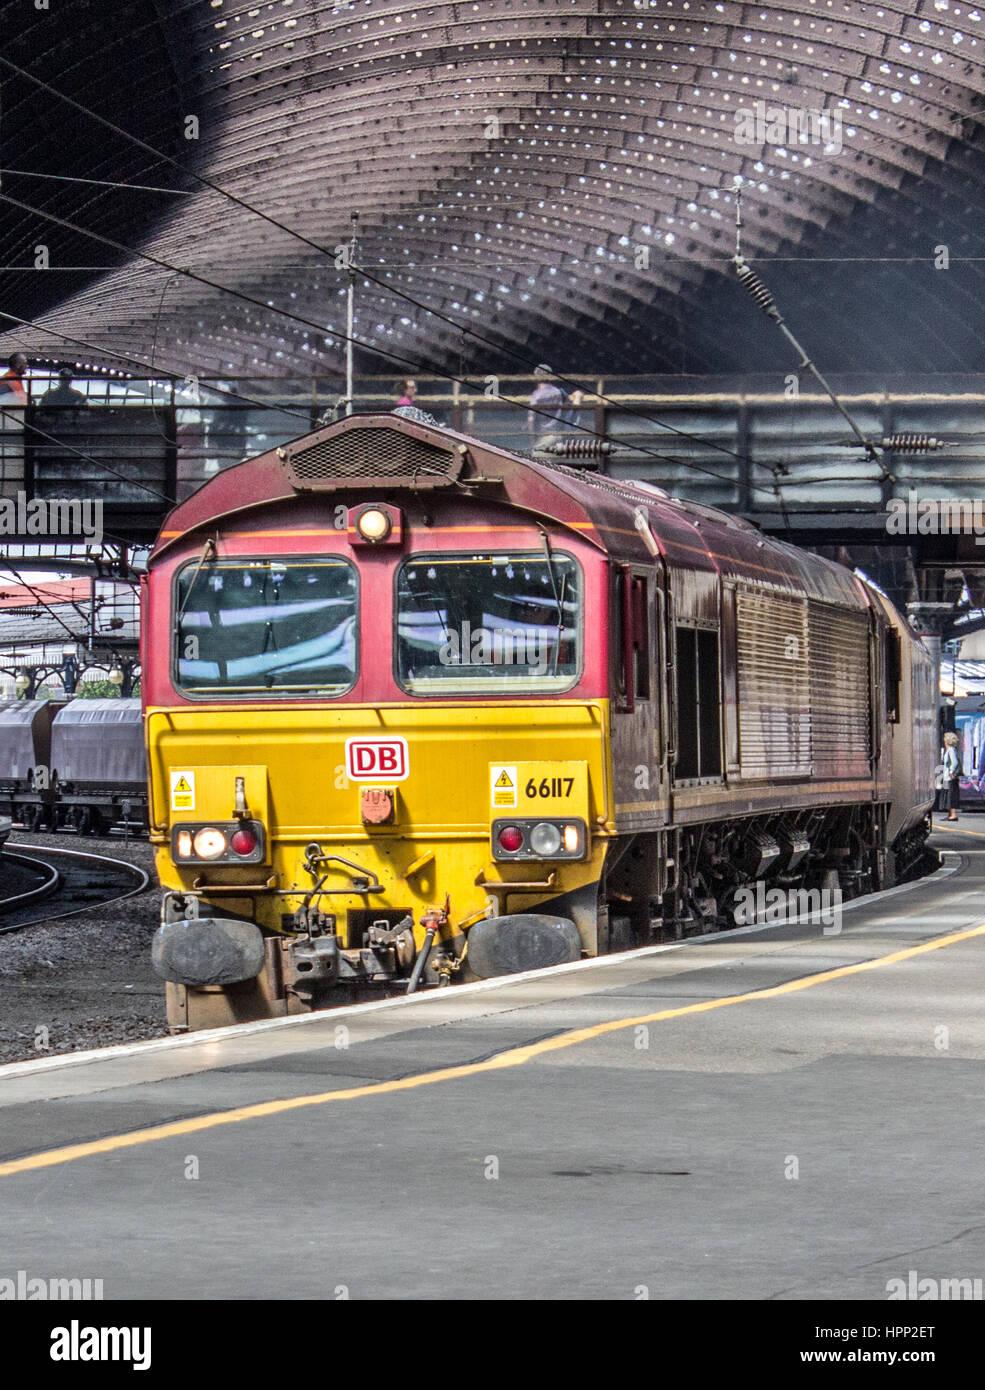 Class 66 Frieght Diesel Locomotive Train passing through York Station - Stock Image